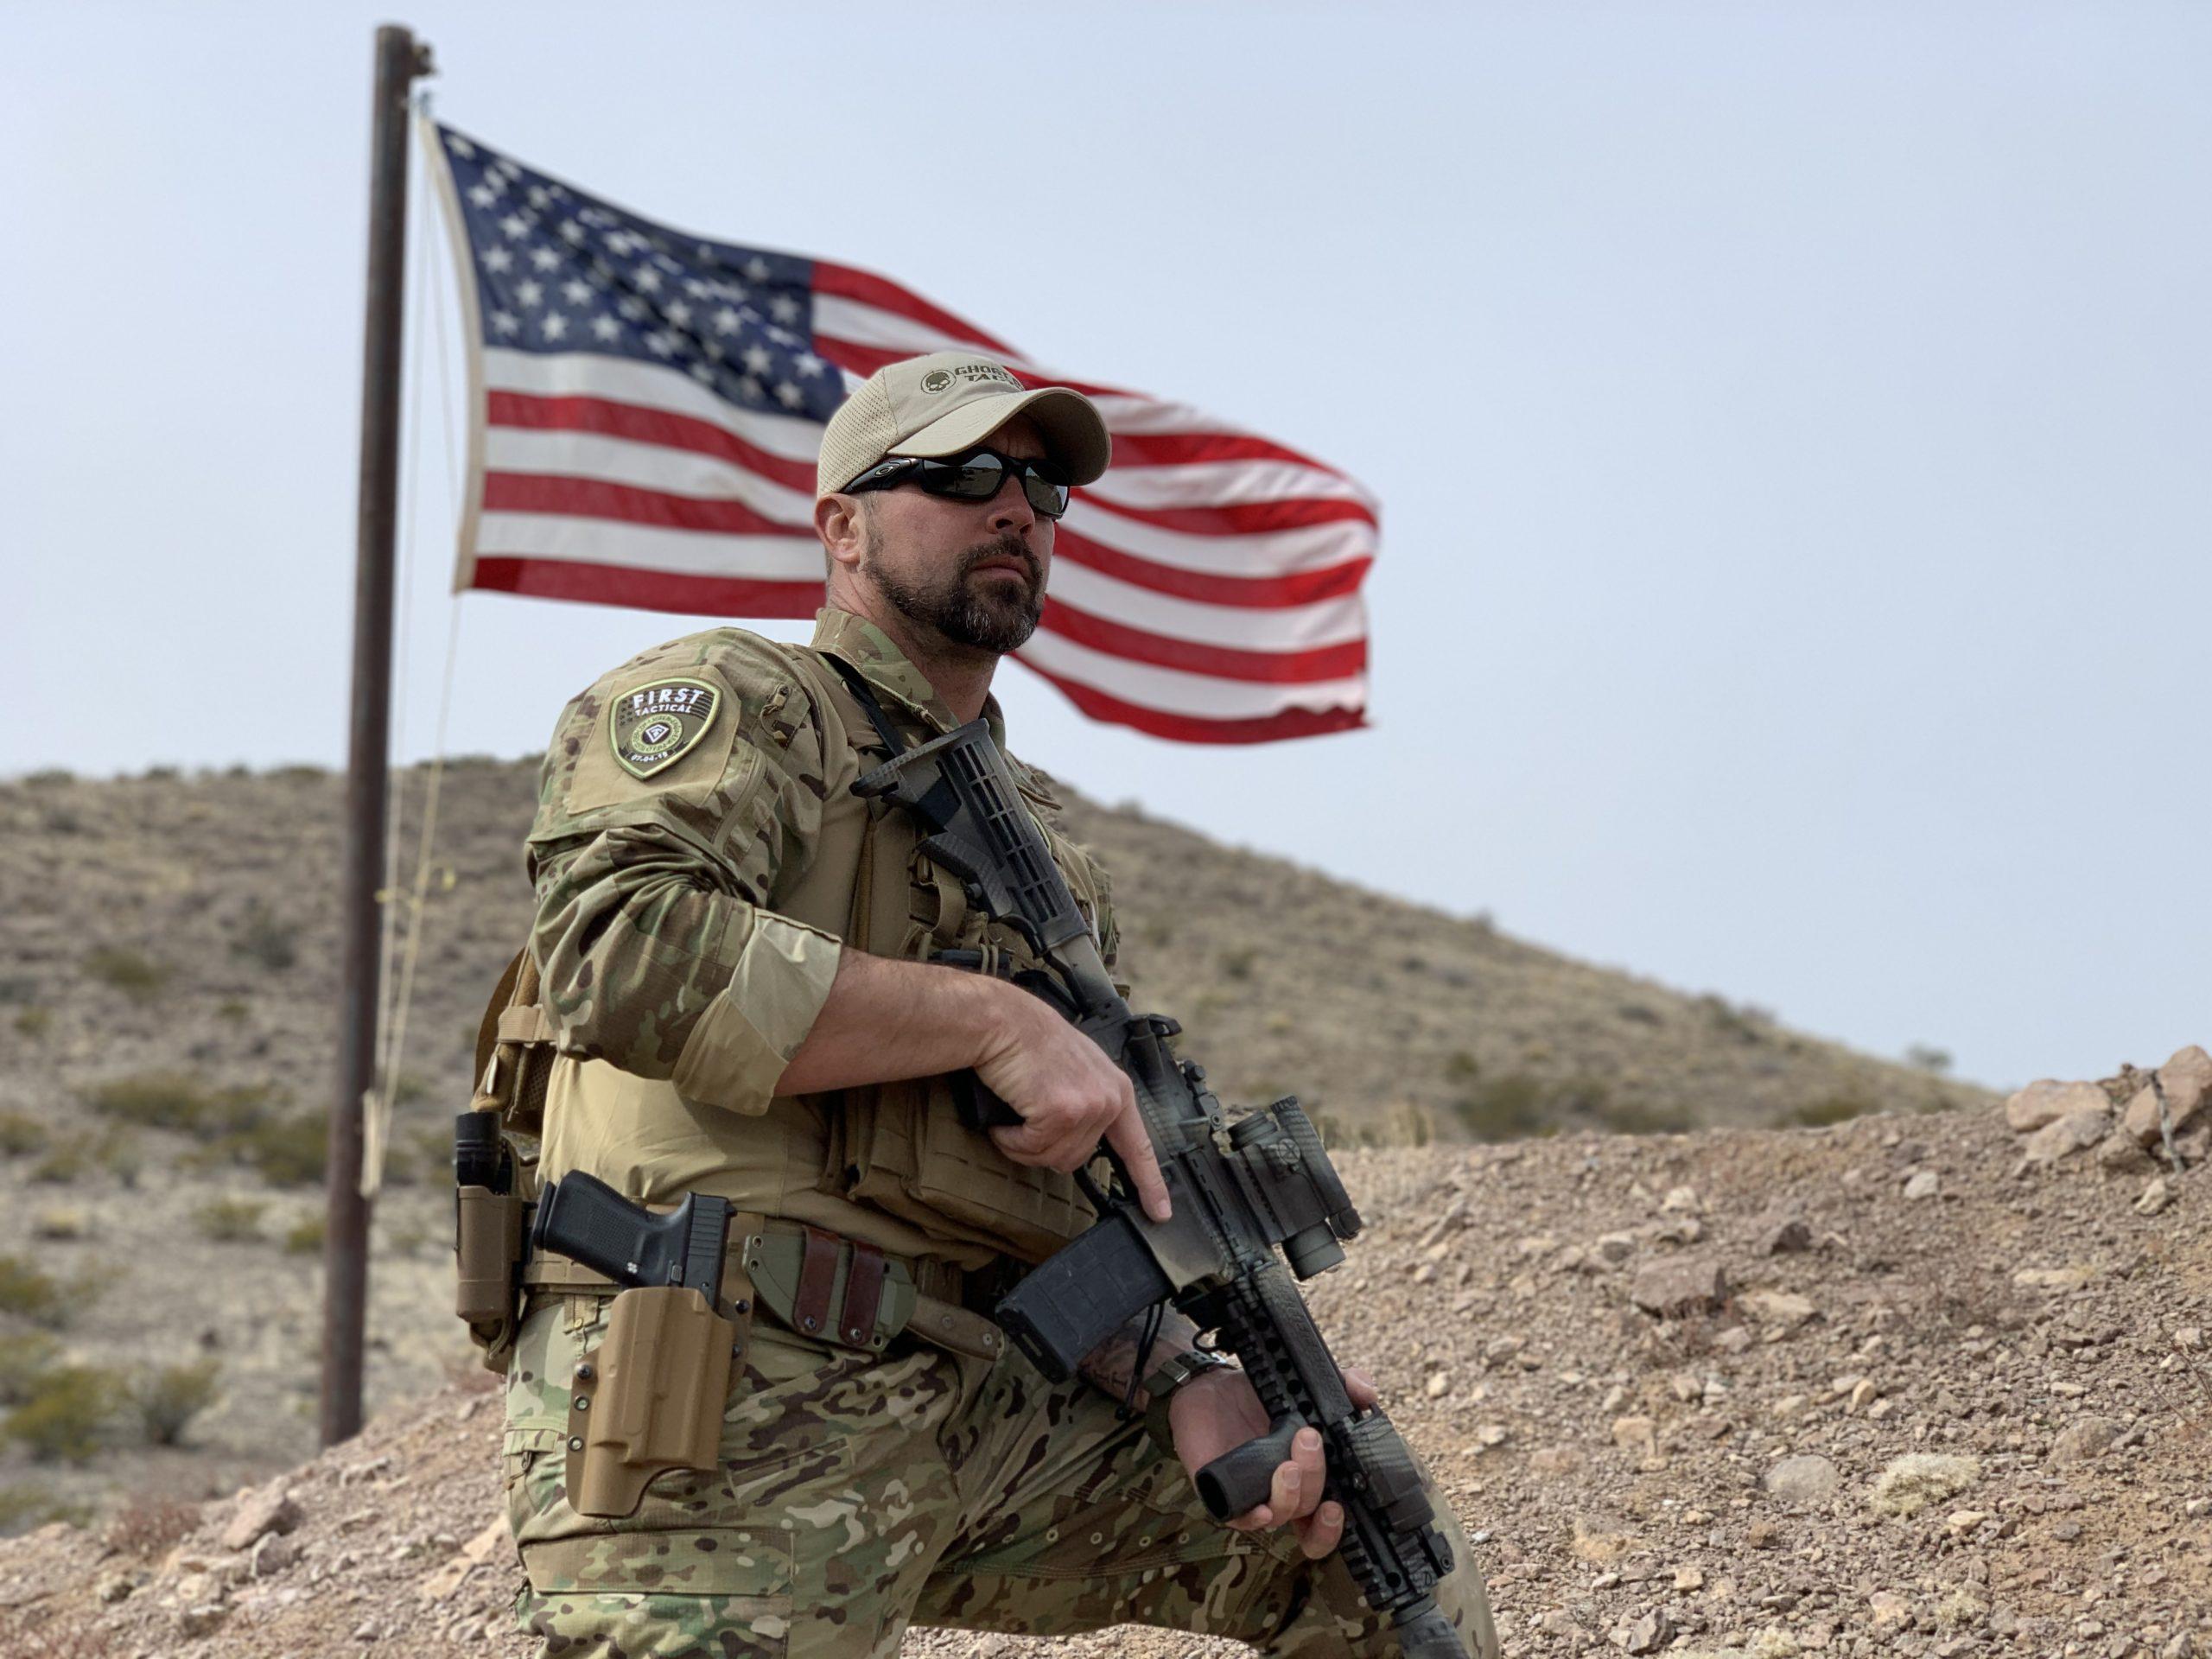 Sgt. Nick Rians